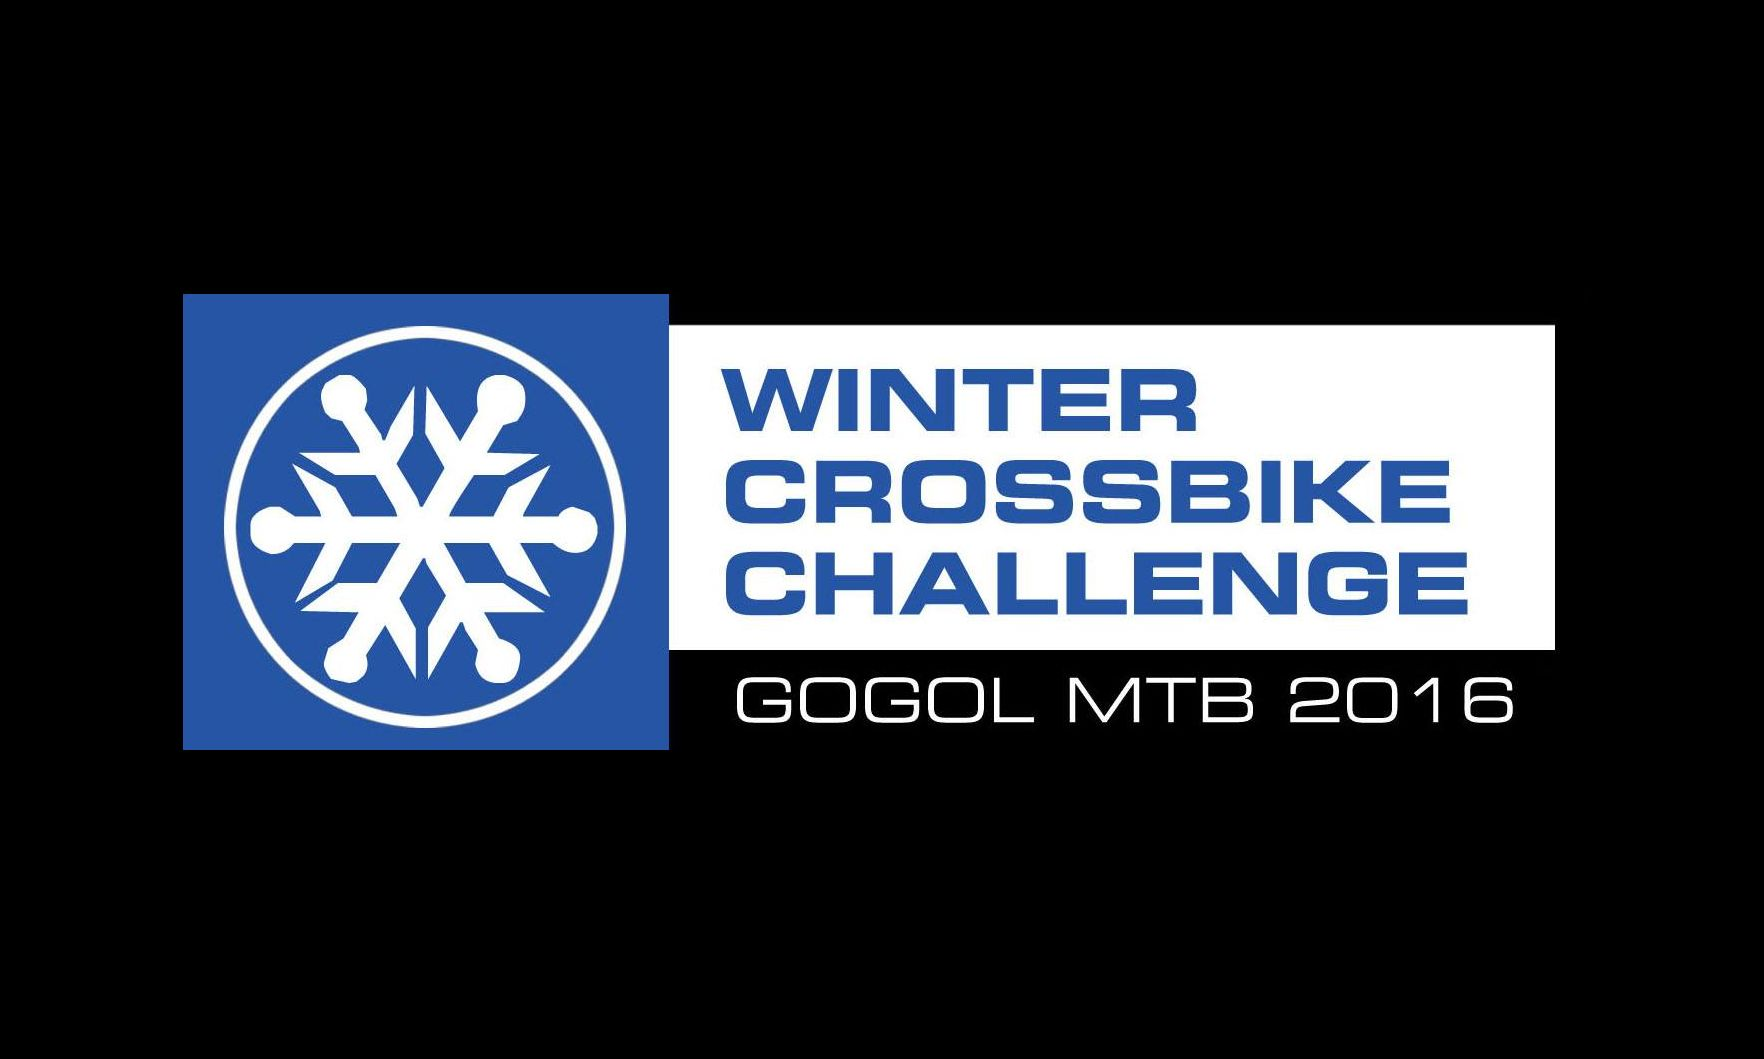 Kalendarz Winter CrossBike Challenge GogolMTB 2016